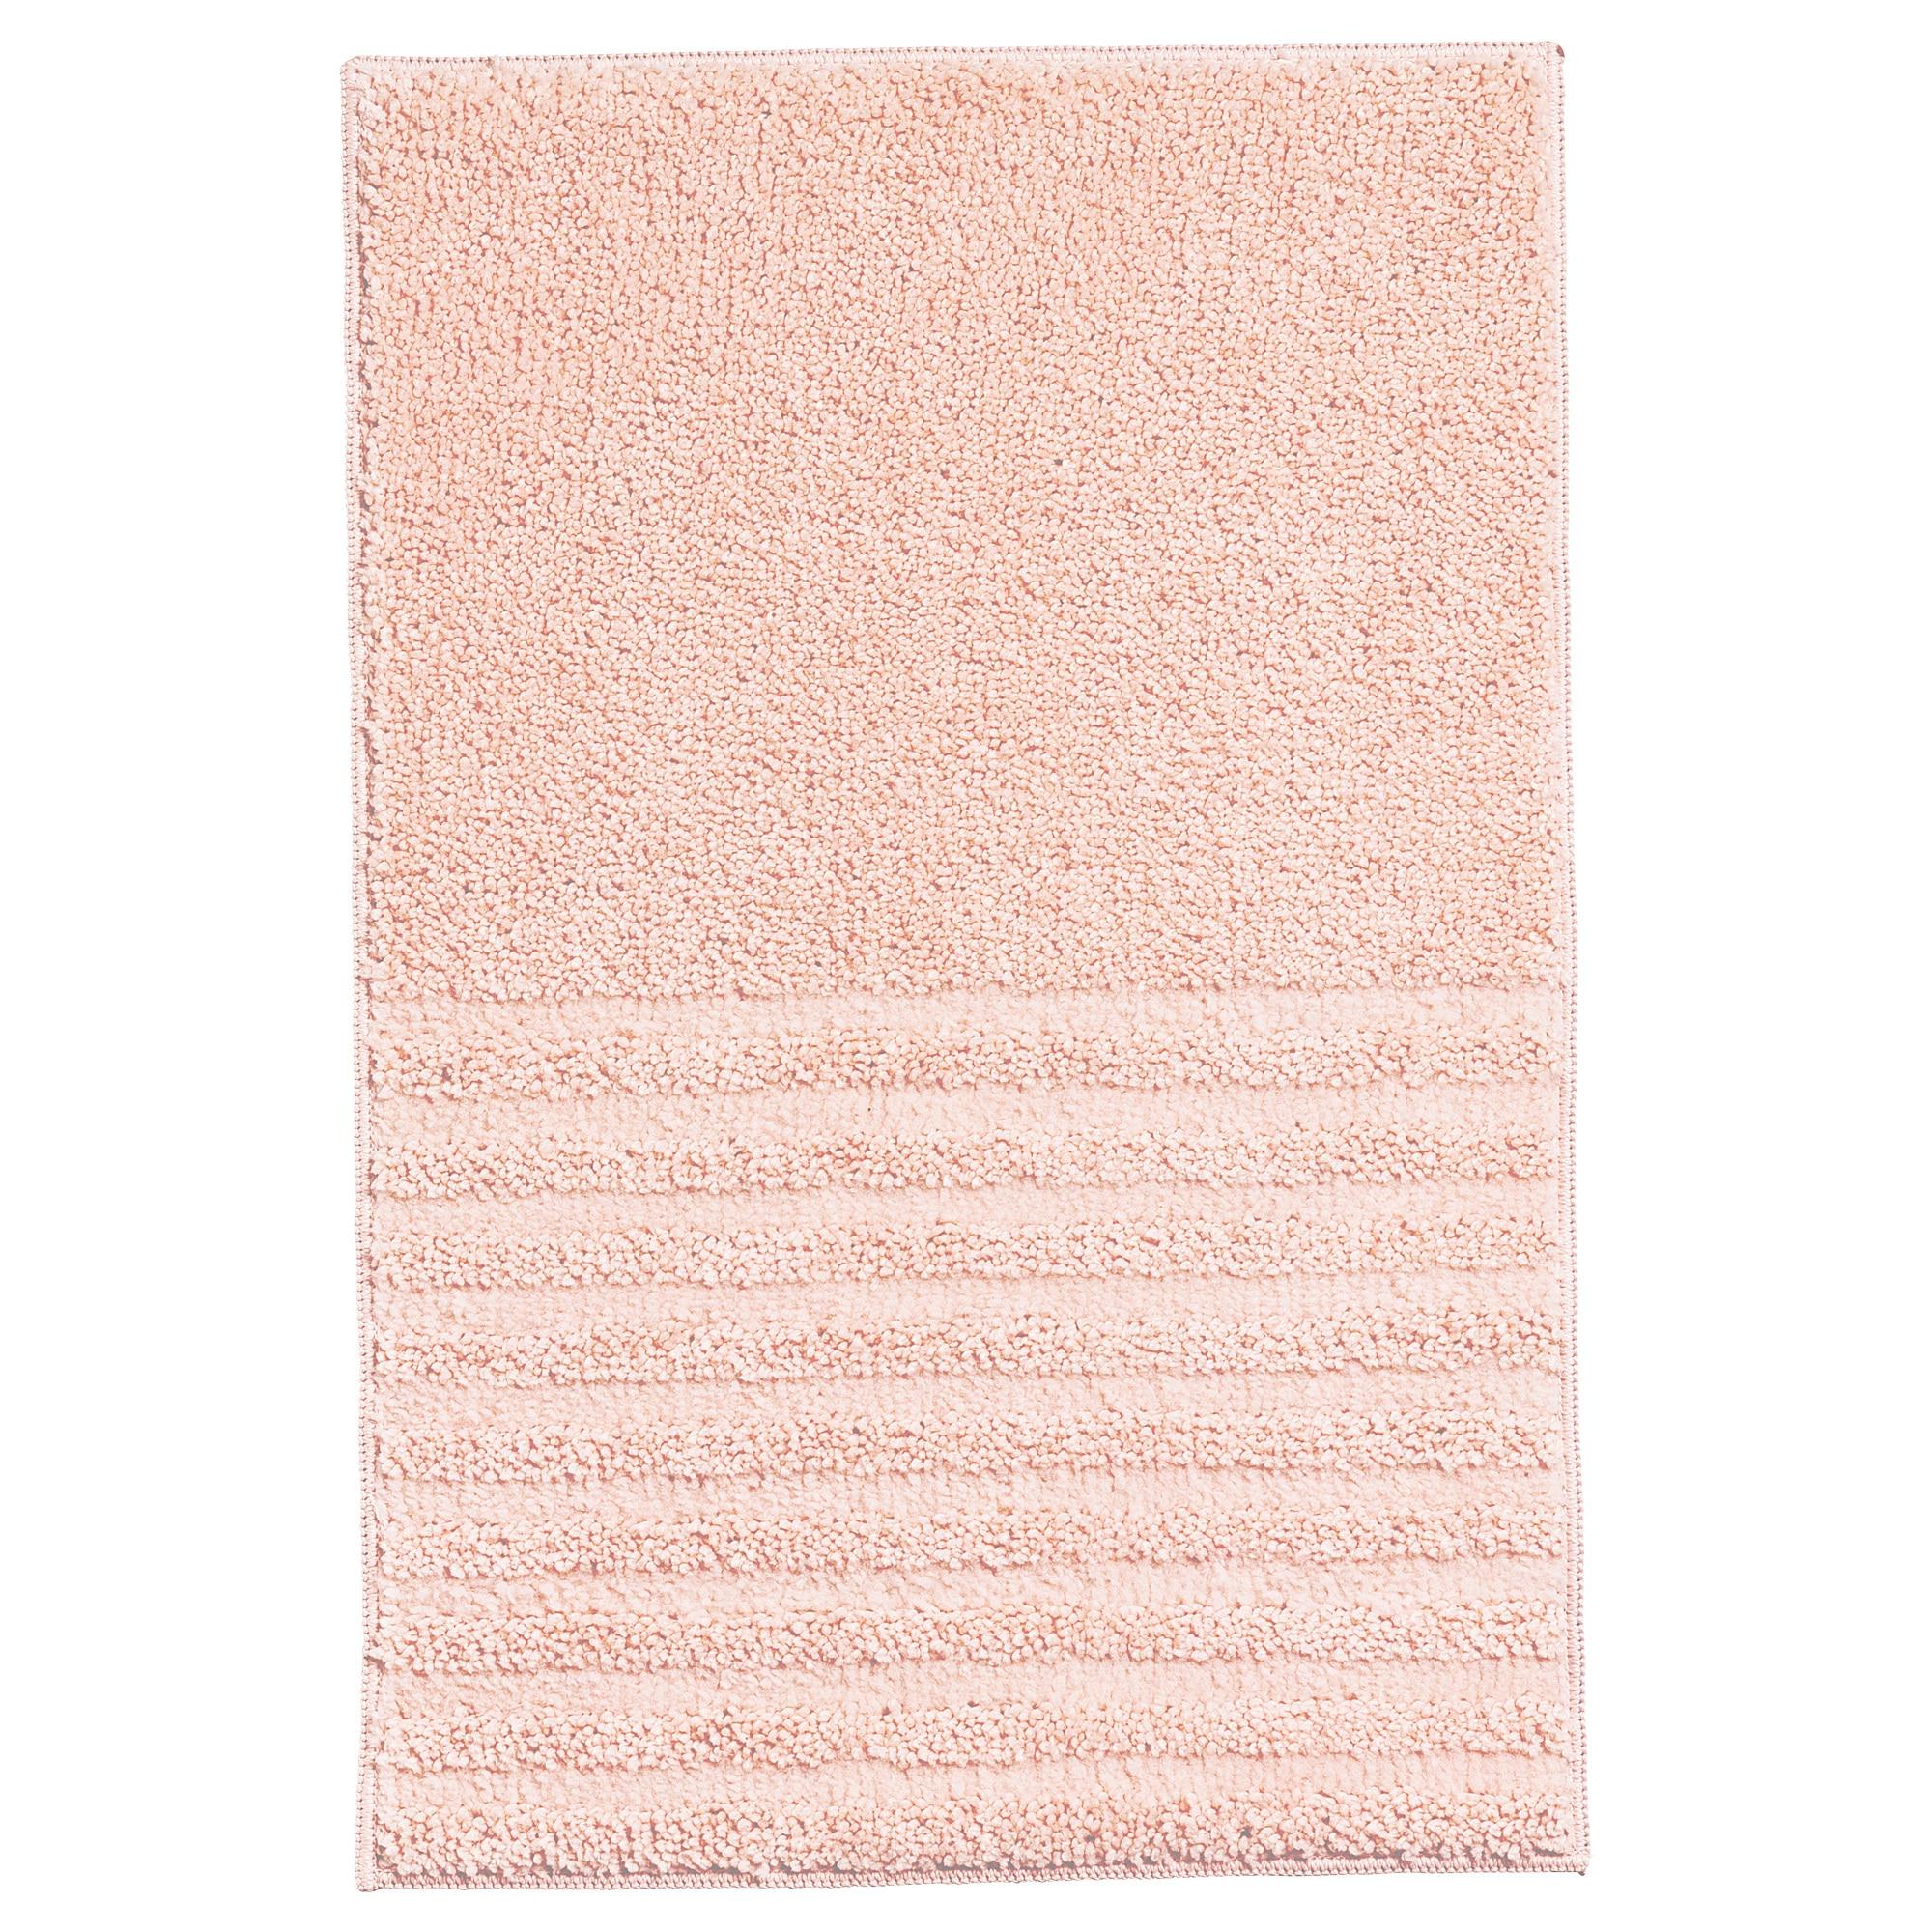 VOXSJÖN Tappeto per bagno, rosa pallido | Casa | Pinterest | Bath ...